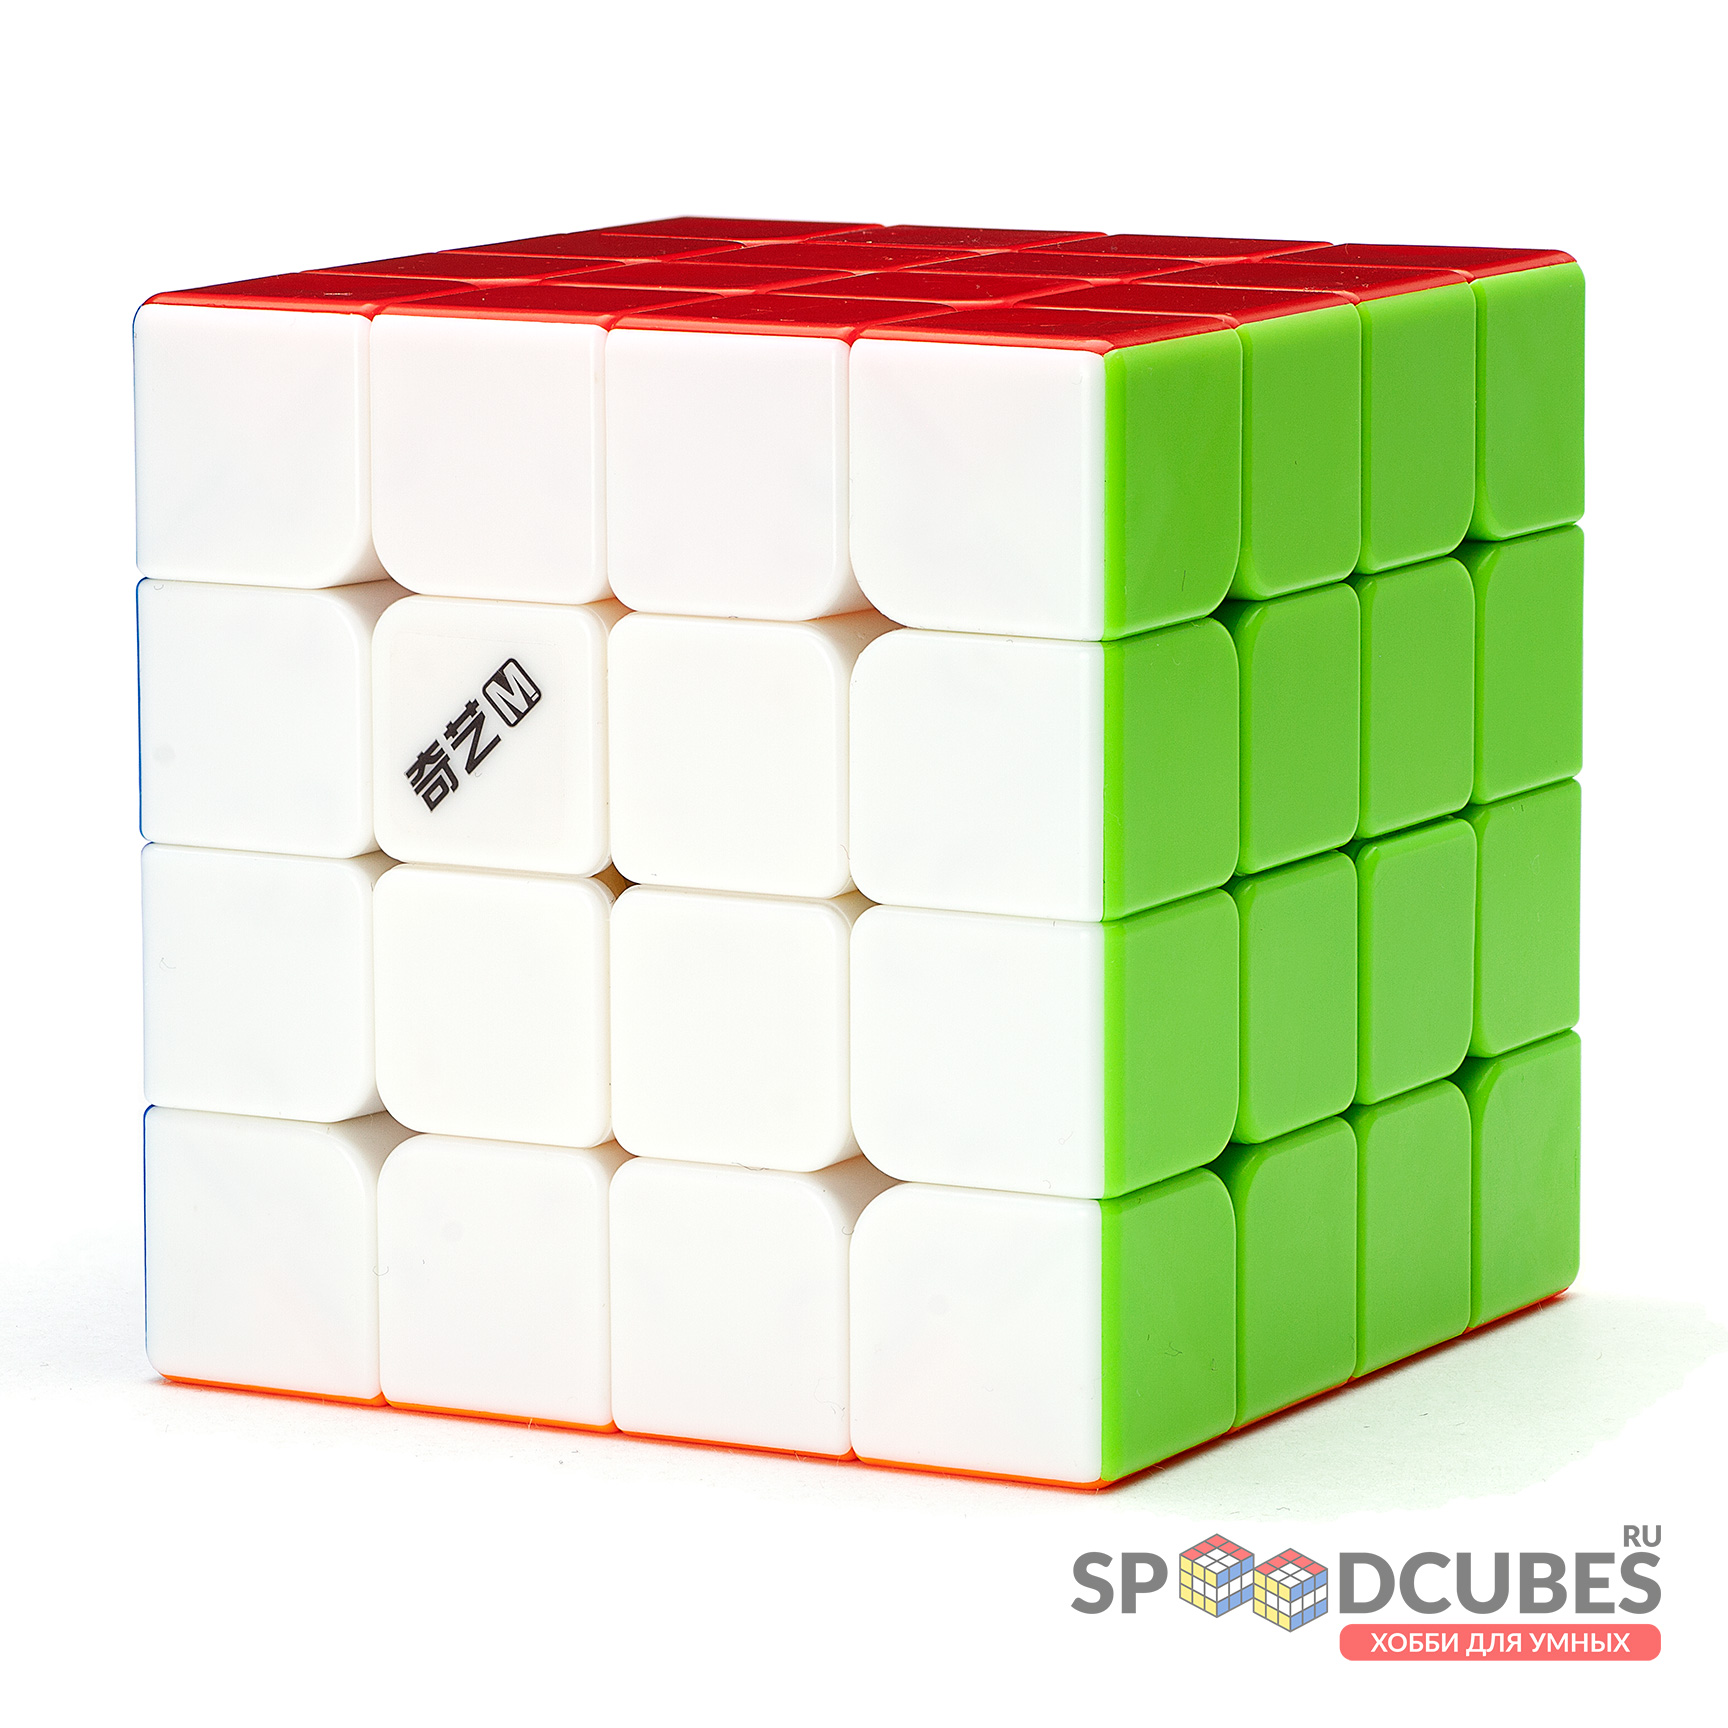 QiYi (MoFangGe) MS 4x4x4 Magnetic